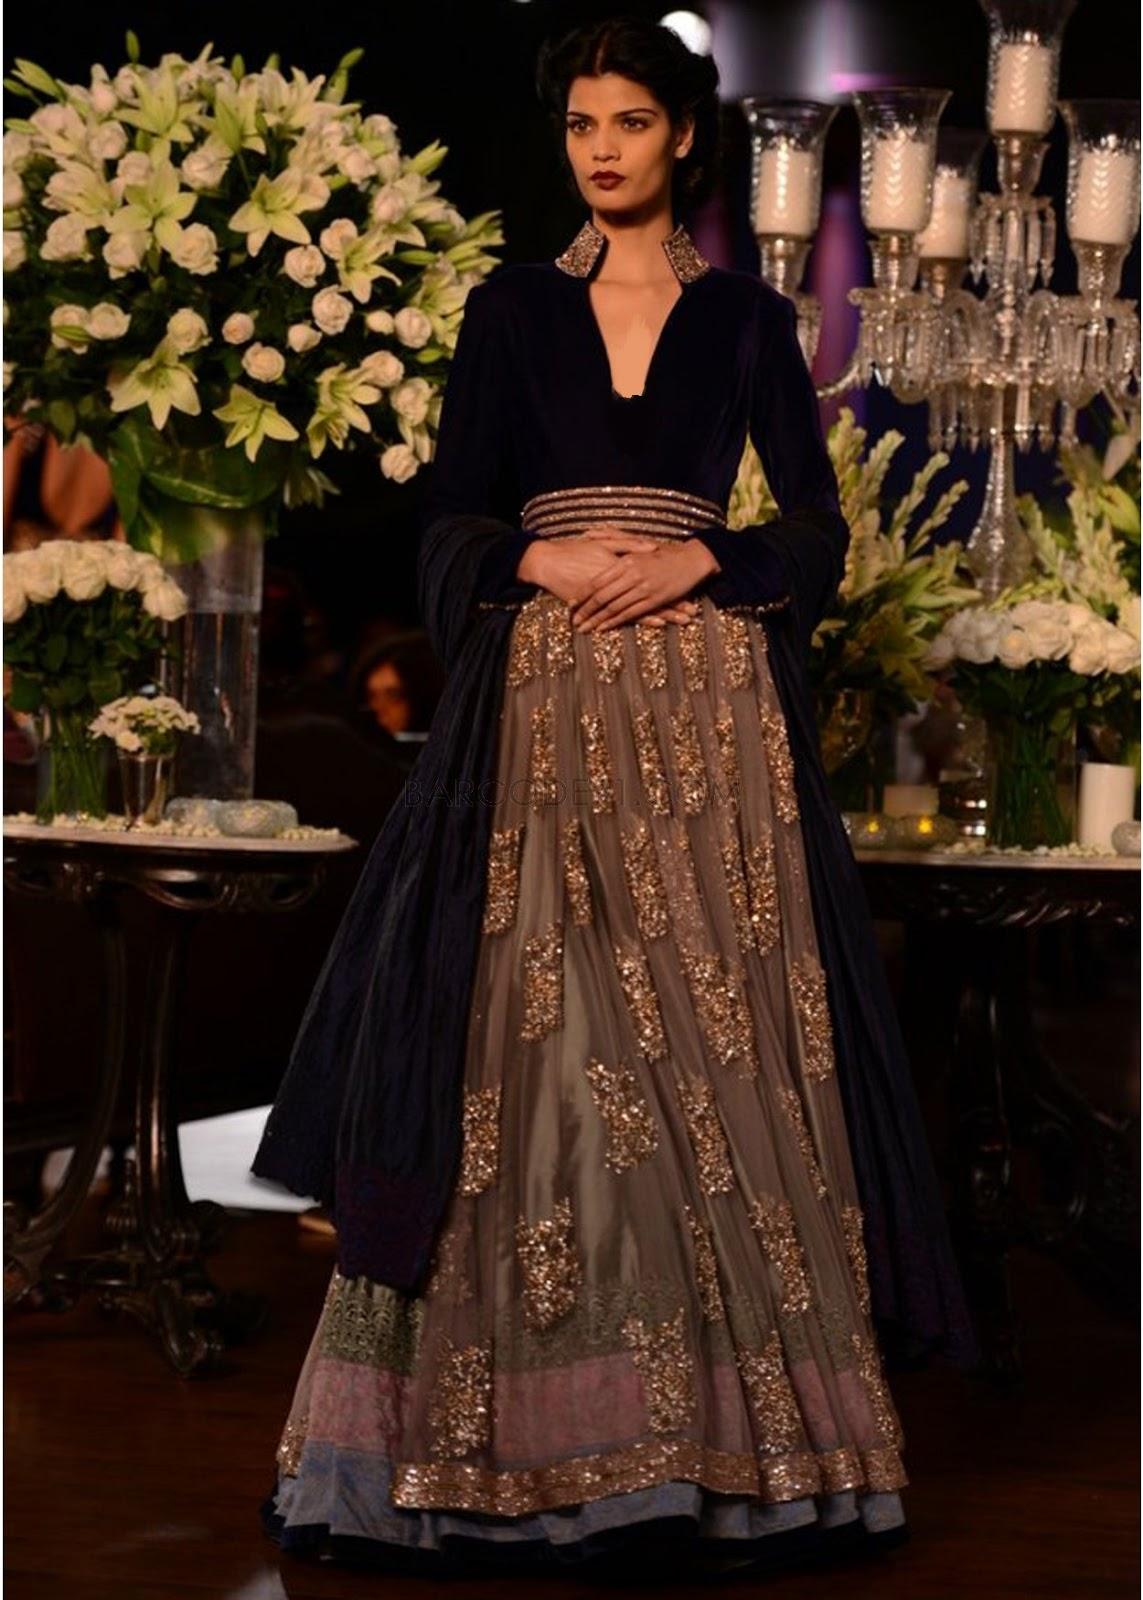 manish malhotra collection delhi week couture ethnic dresses pcj bythe inspired heavy lehenga dress silhouettes bridal deepika indian latest clothes